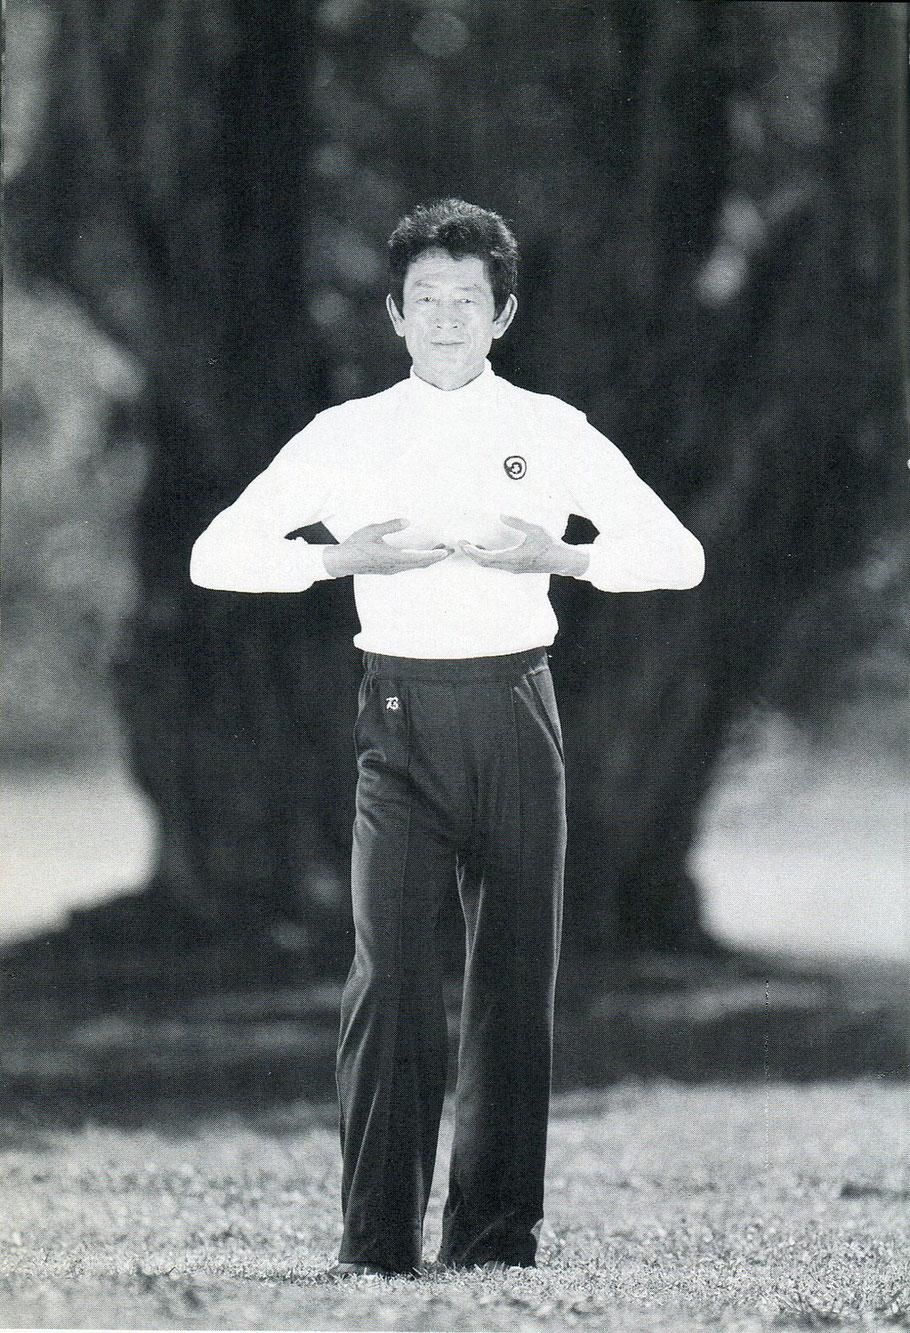 Kozo Nishino